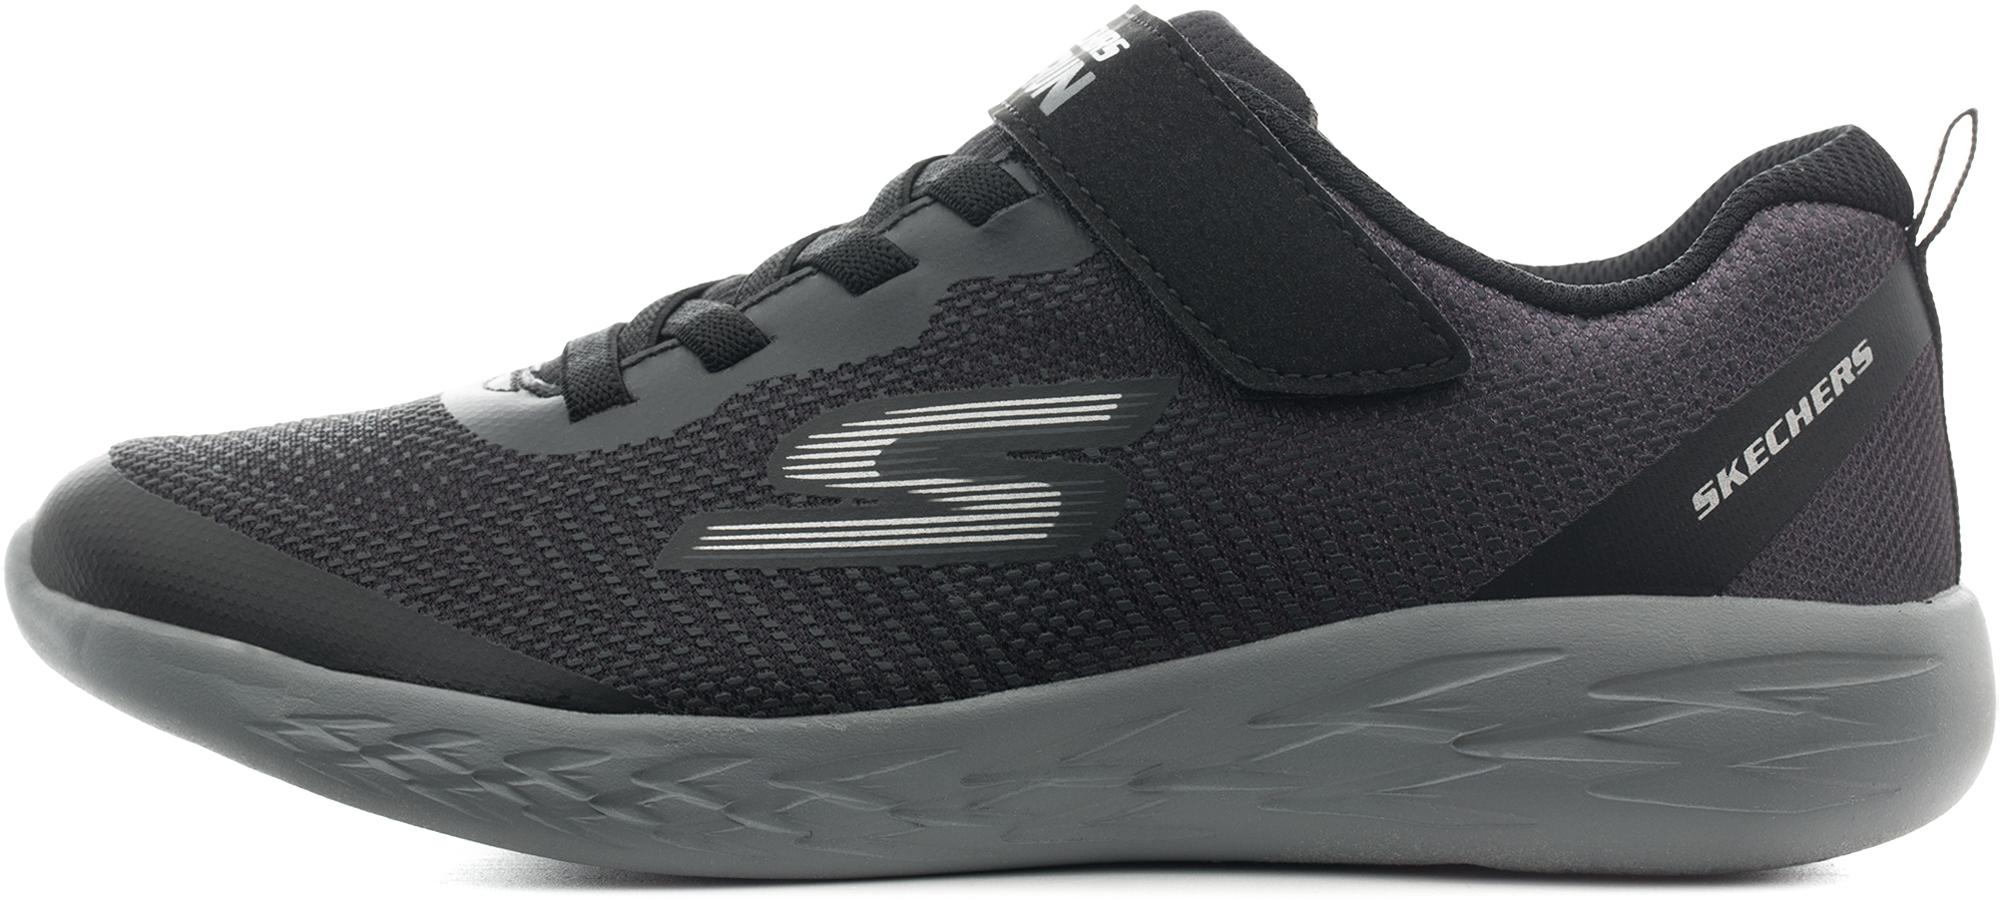 skechers кроссовки для девочек skechers go run 600 sparkle speed размер 38 Skechers Кроссовки для мальчиков Skechers Go Run 600-Farrox, размер 30